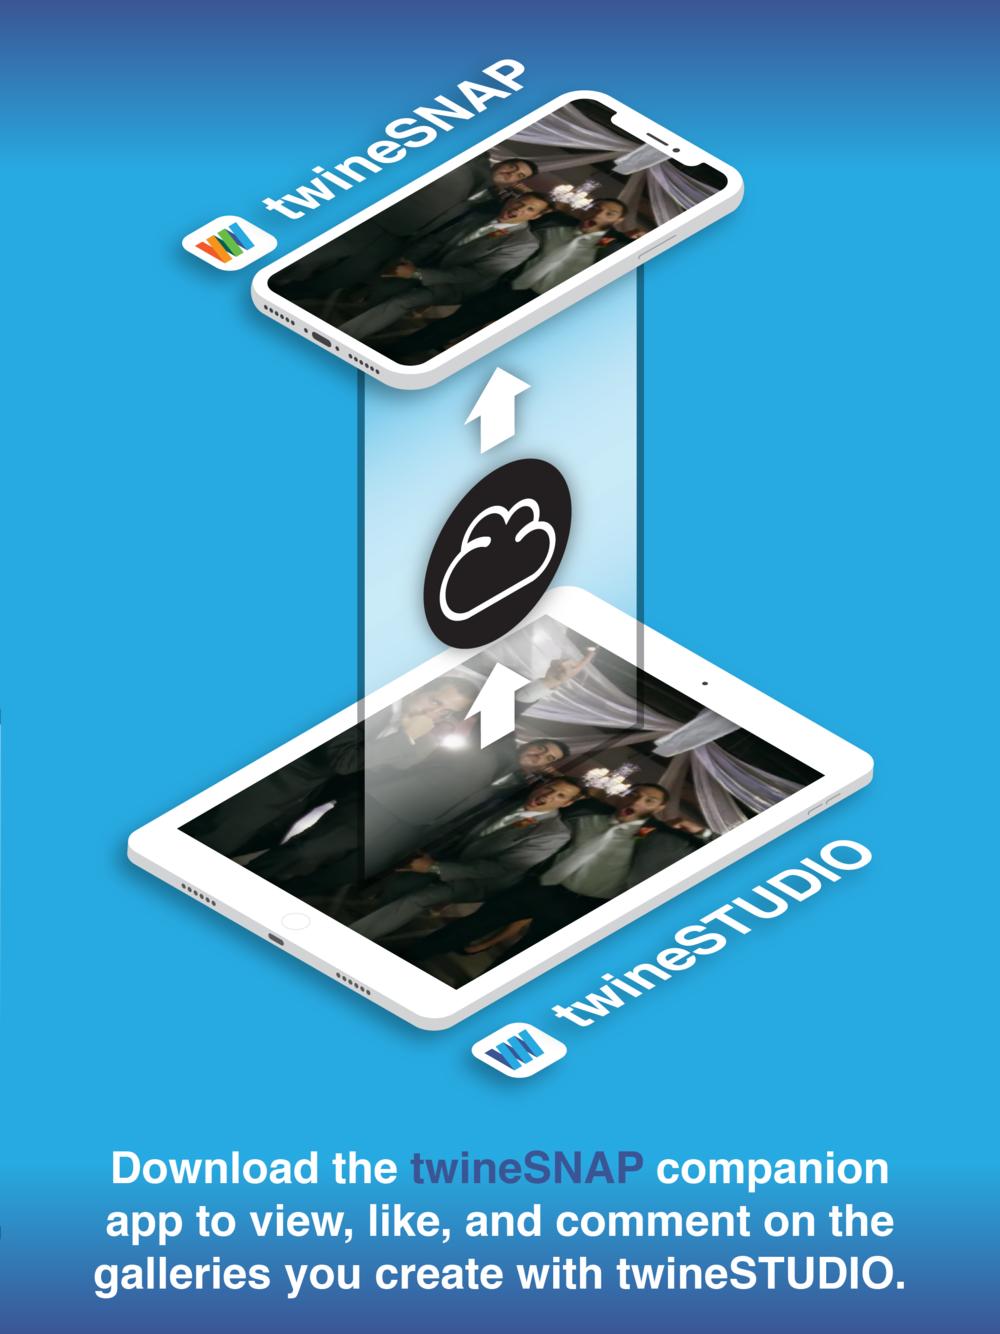 STUDIO App Store_slide 3.png